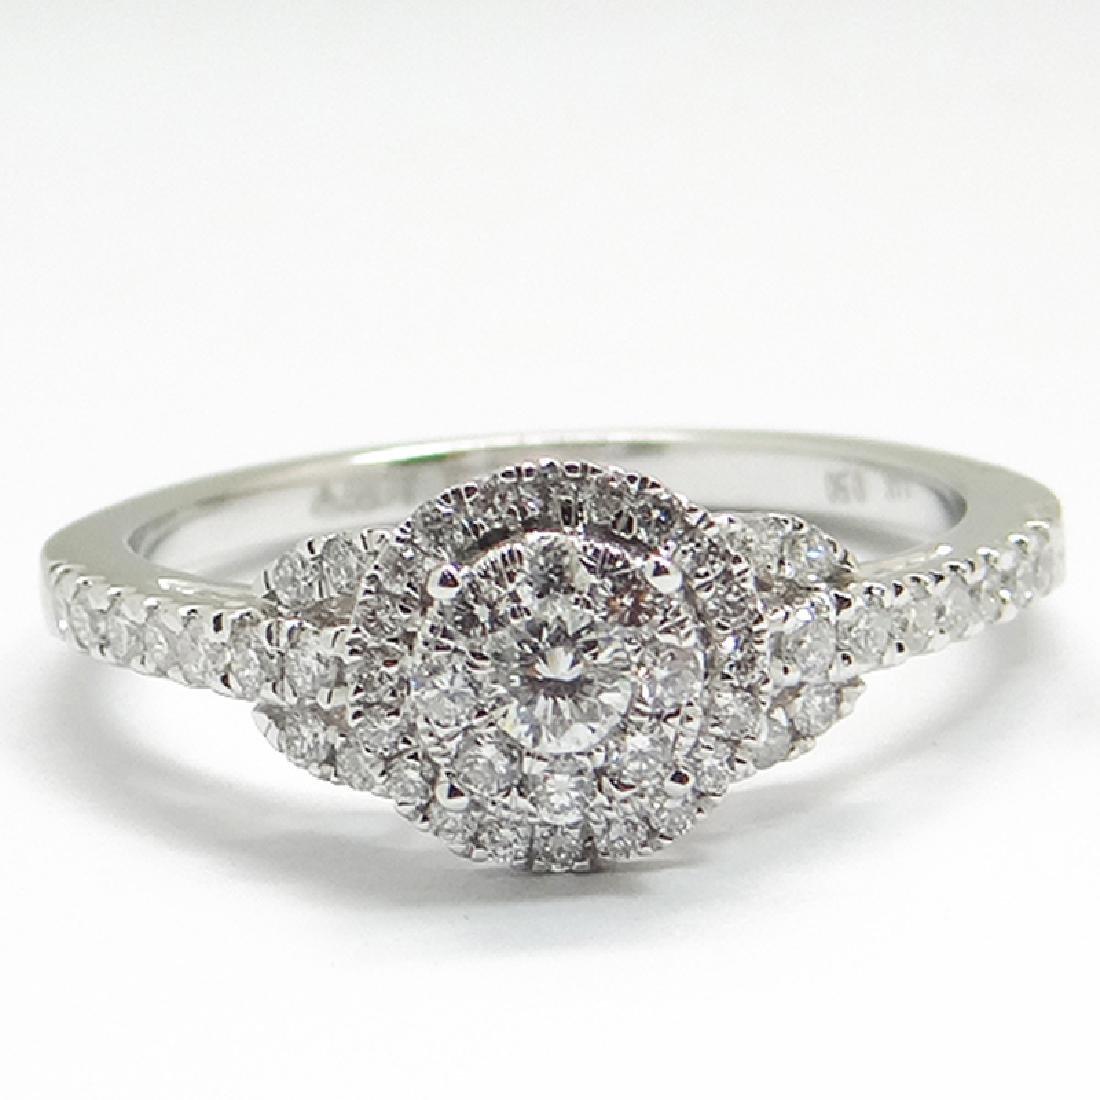 *Fine Jewelry 14 kt. White Gold, 0.50CT Round Cut